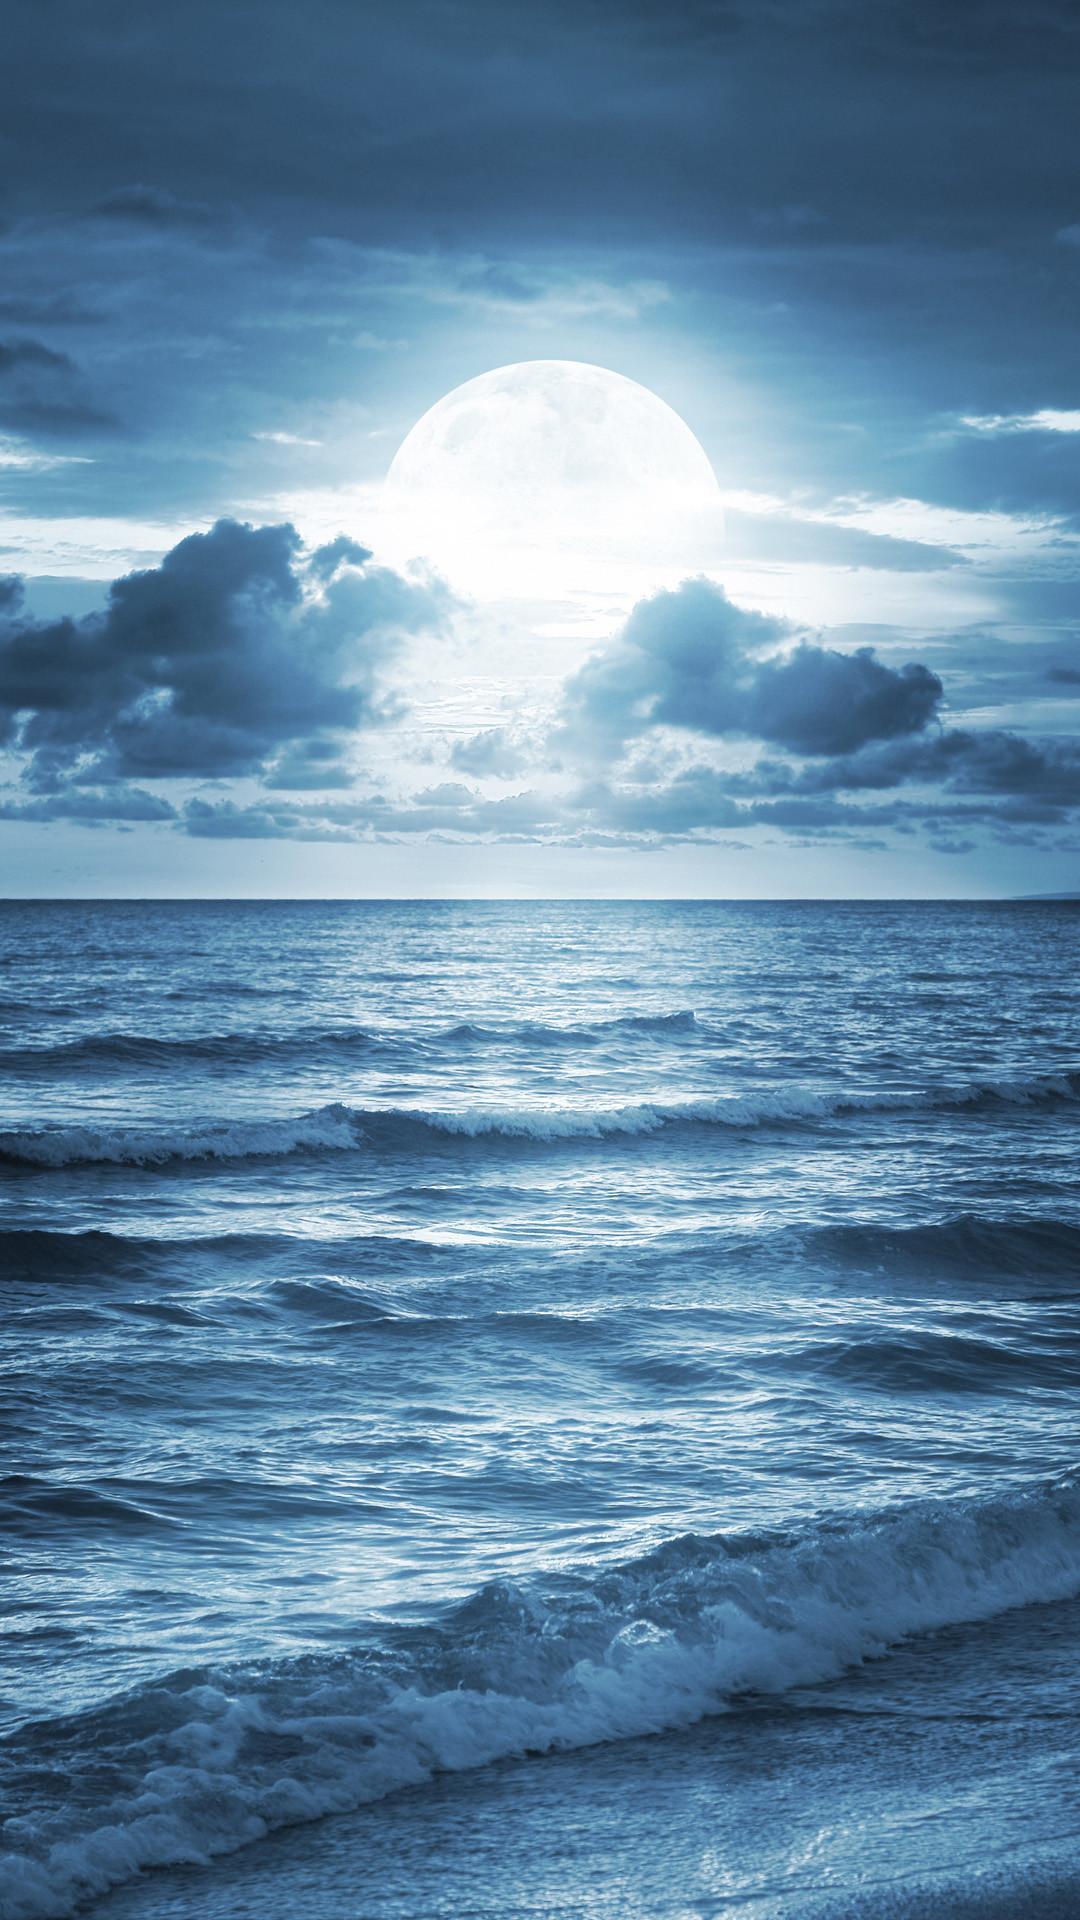 Blue Ocean Beach At Dusk iPhone 6 wallpaper